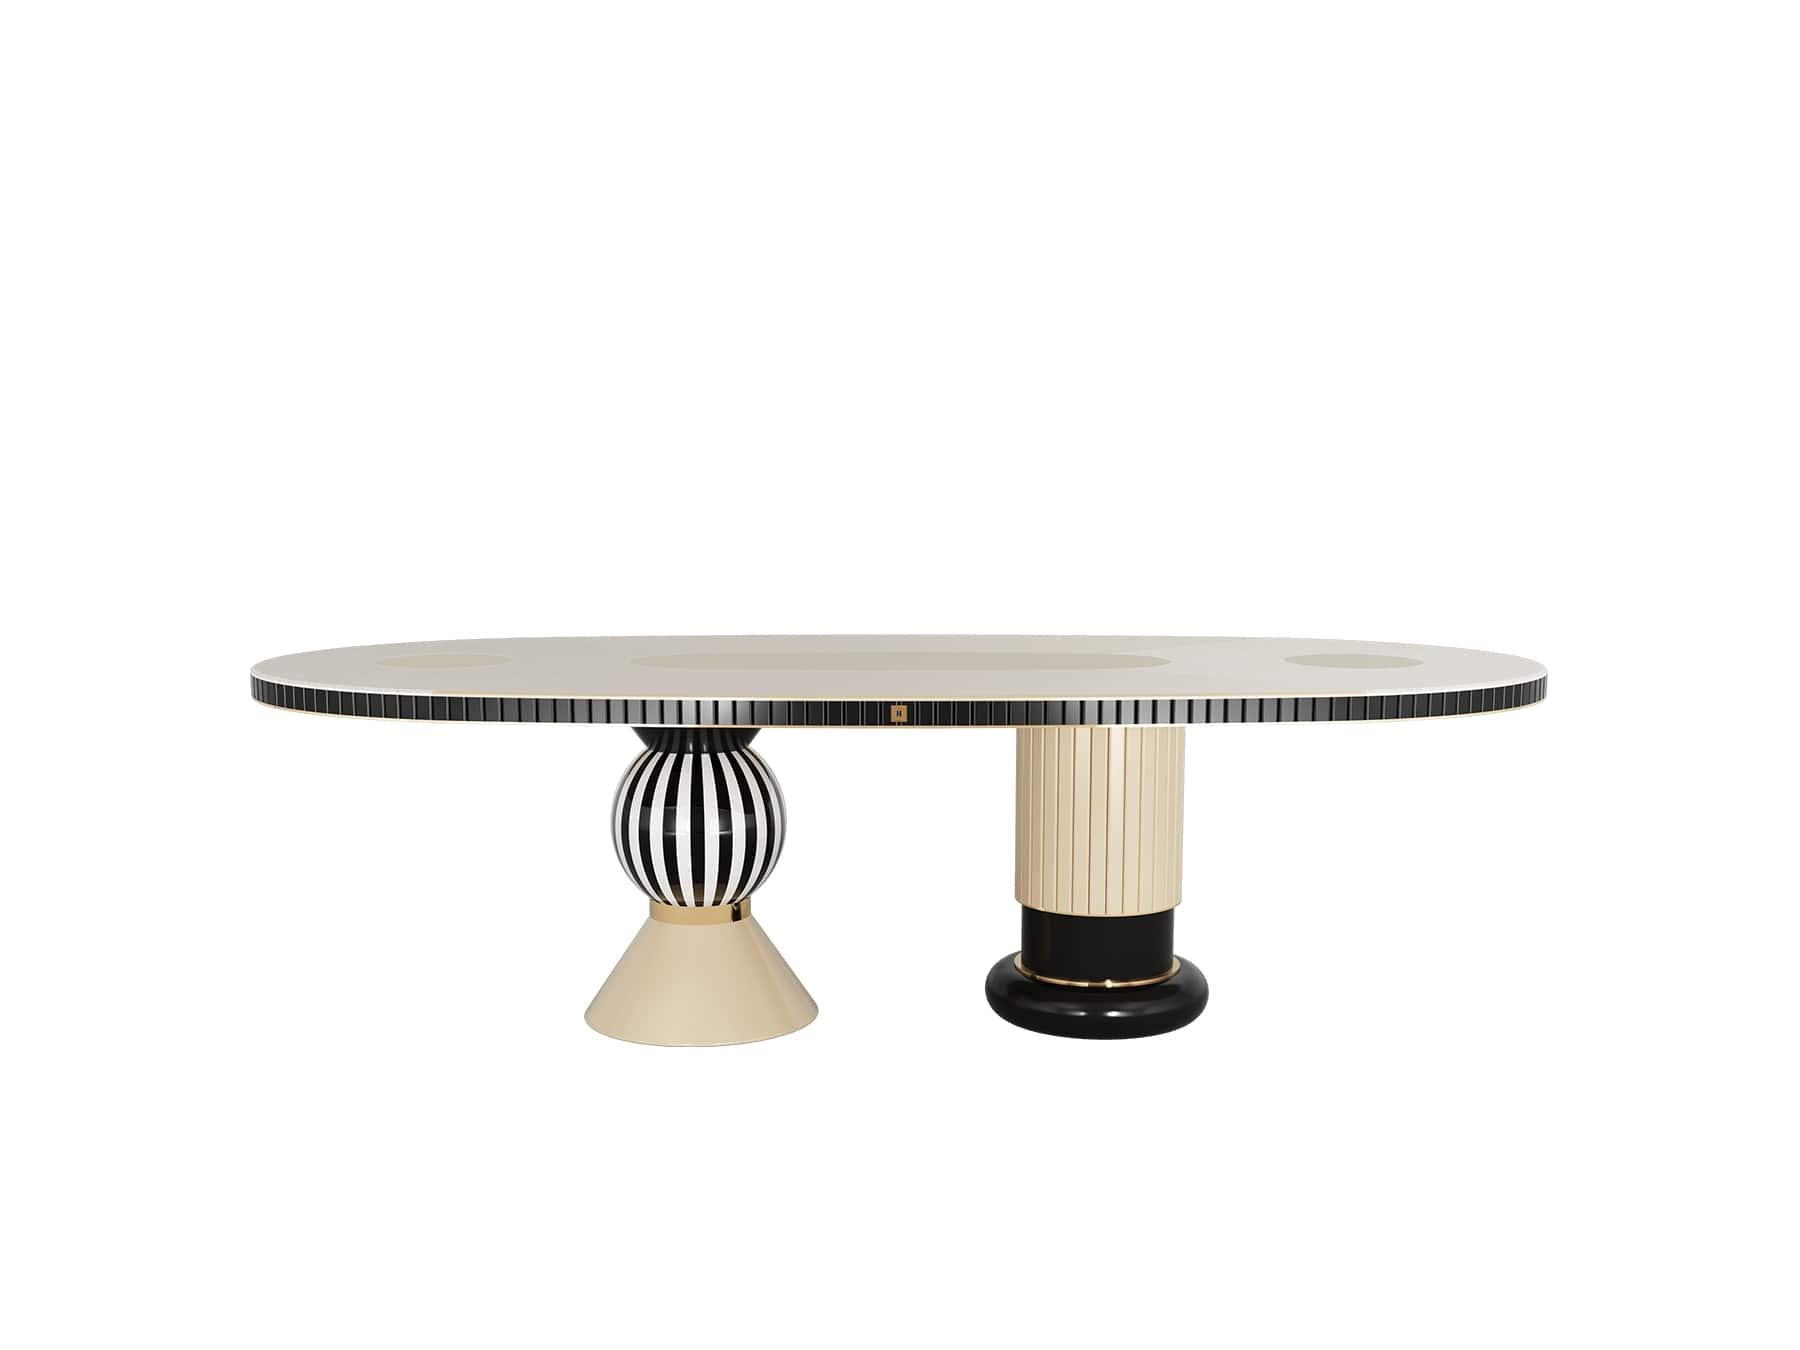 Memphis Design Furniture - Fuschia by Hommés Studio